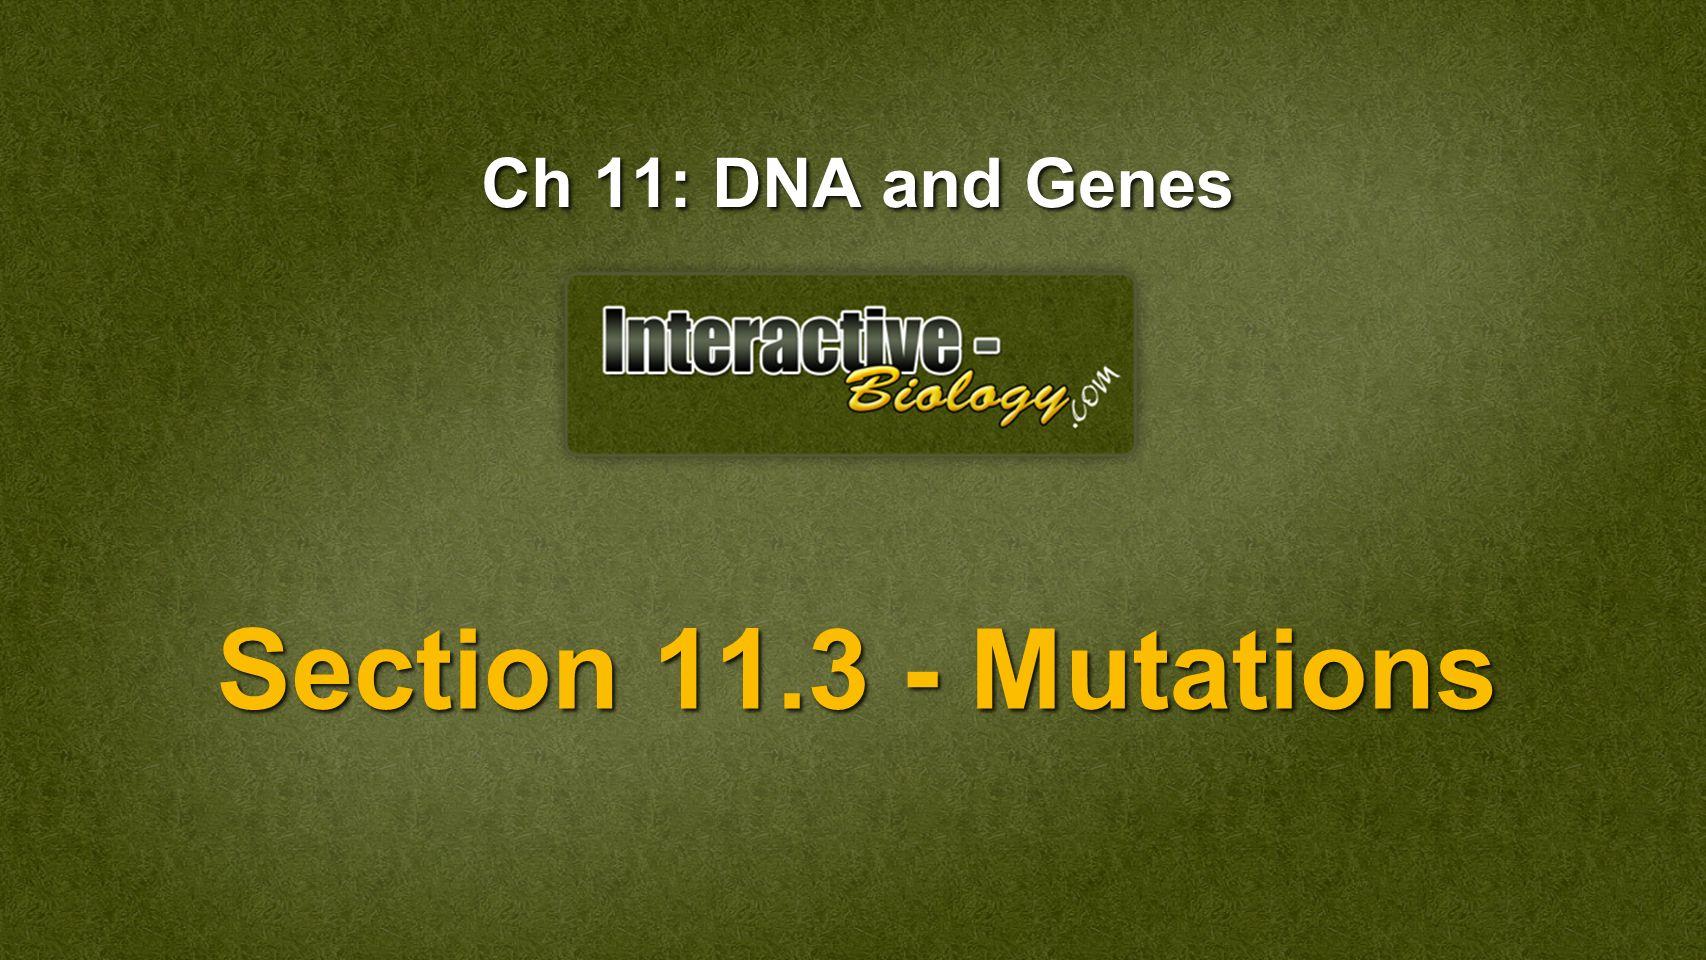 Worksheet Chapter 11 Dna And Genes Worksheet Answers Worksheet Fun Worksheet Study Site